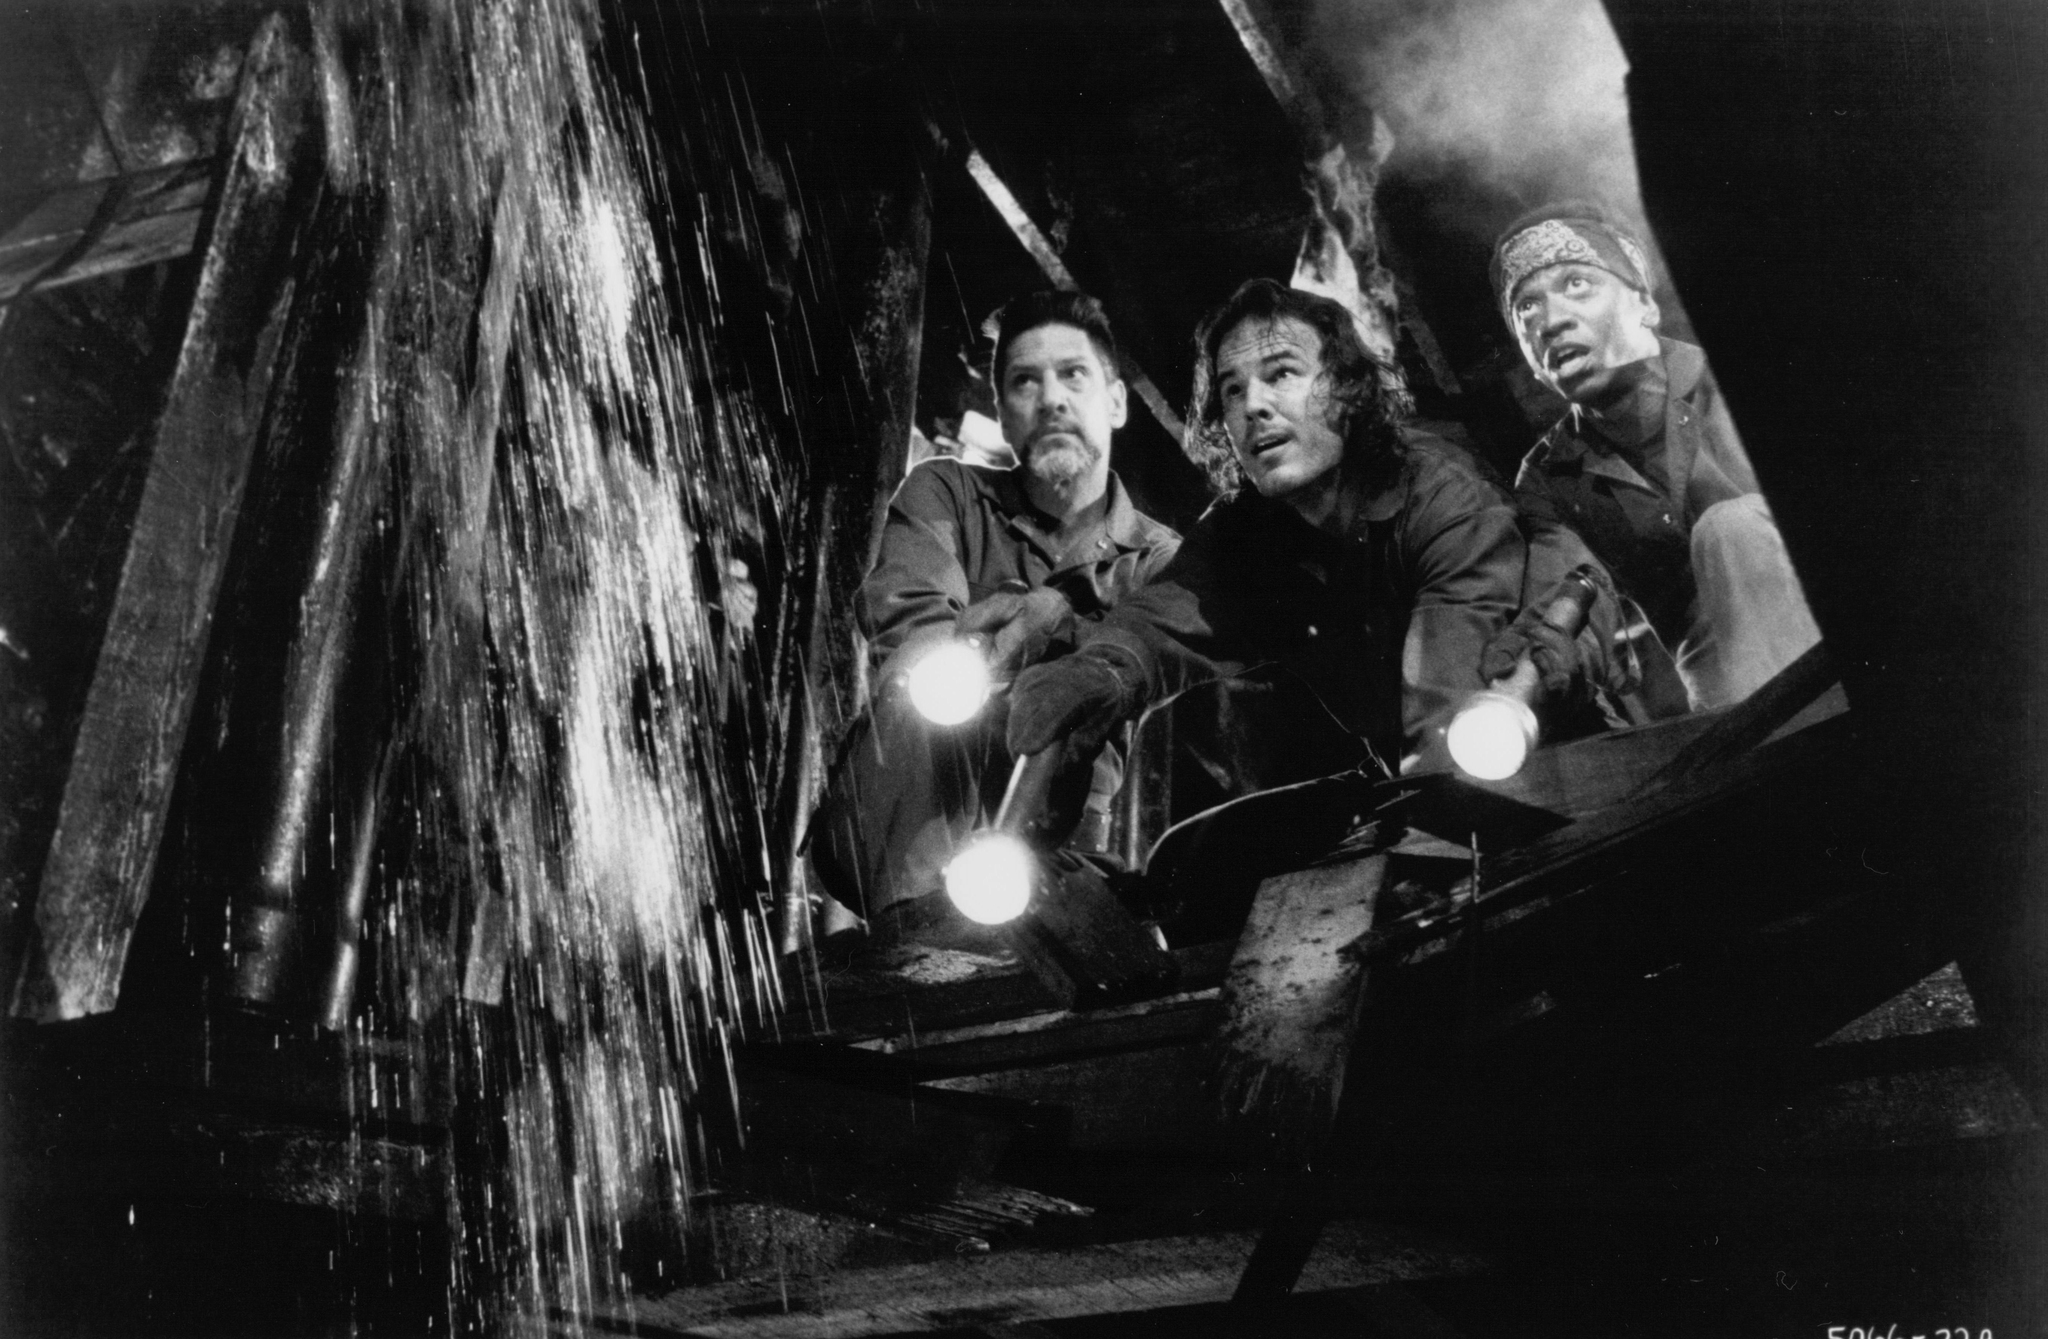 Andrew Divoff, Stephen Macht, and Jimmy Woodard in Graveyard Shift (1990)